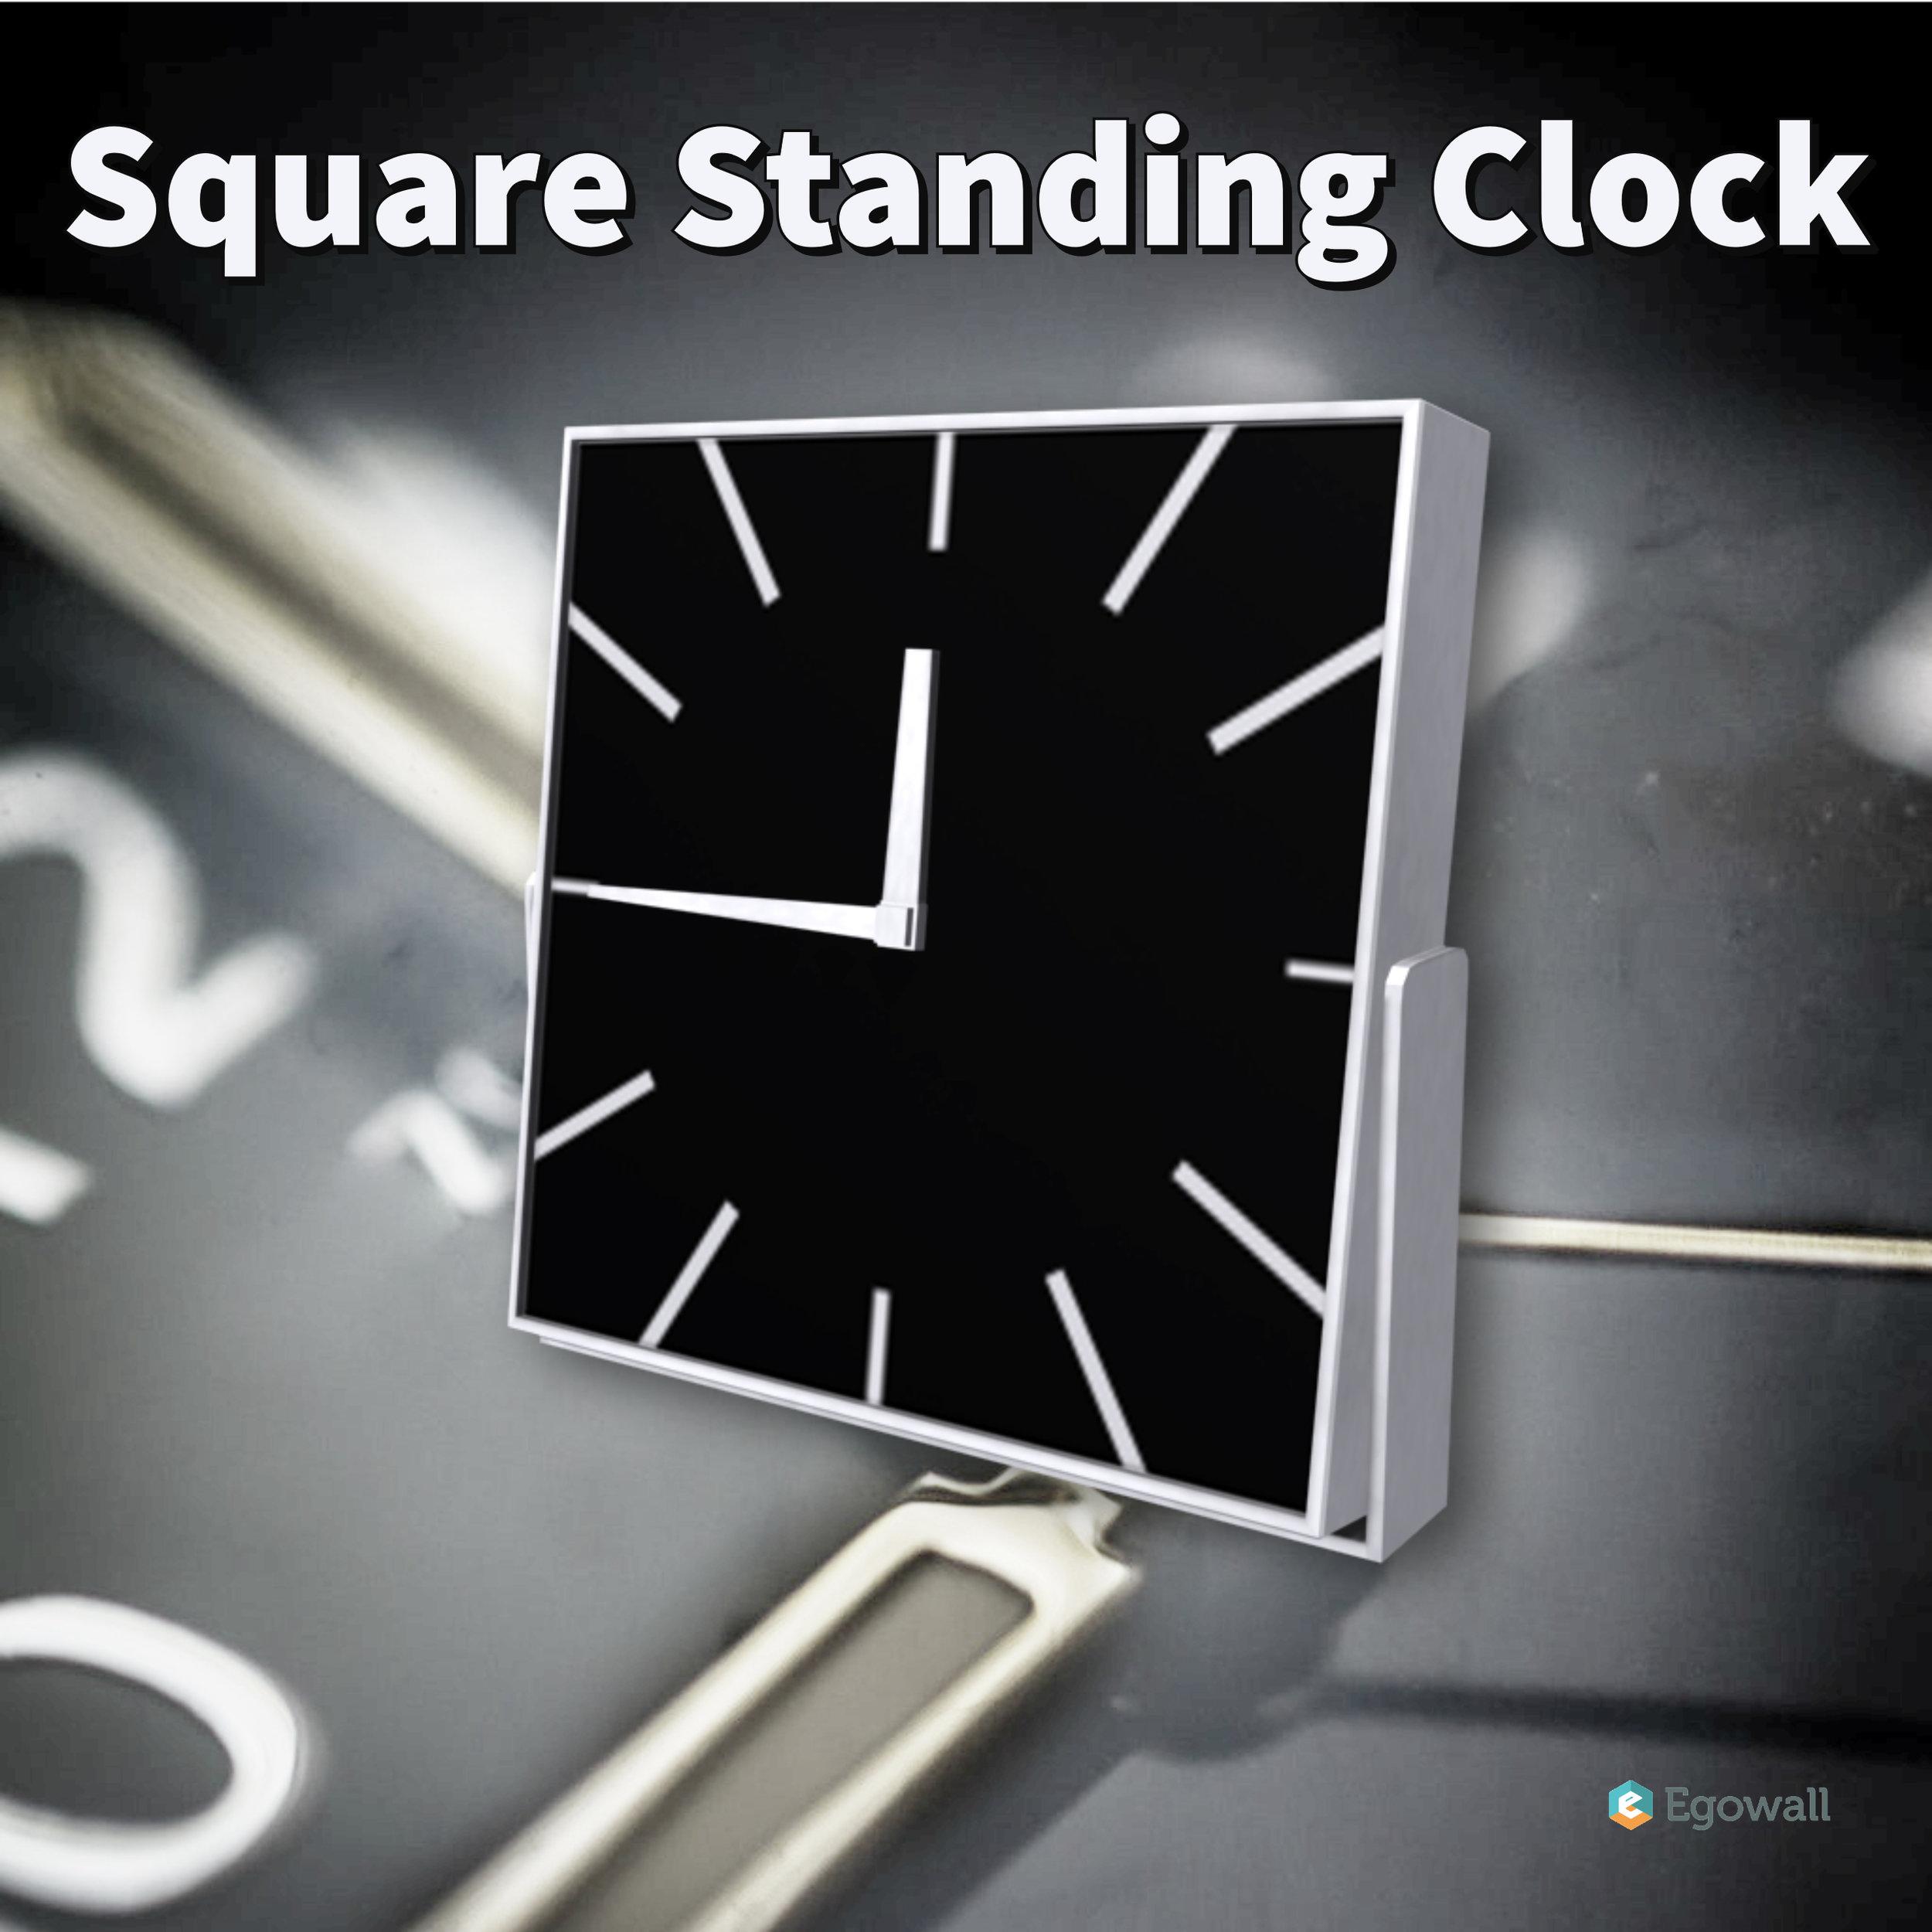 Square Standing Clock.Instagram.jpg